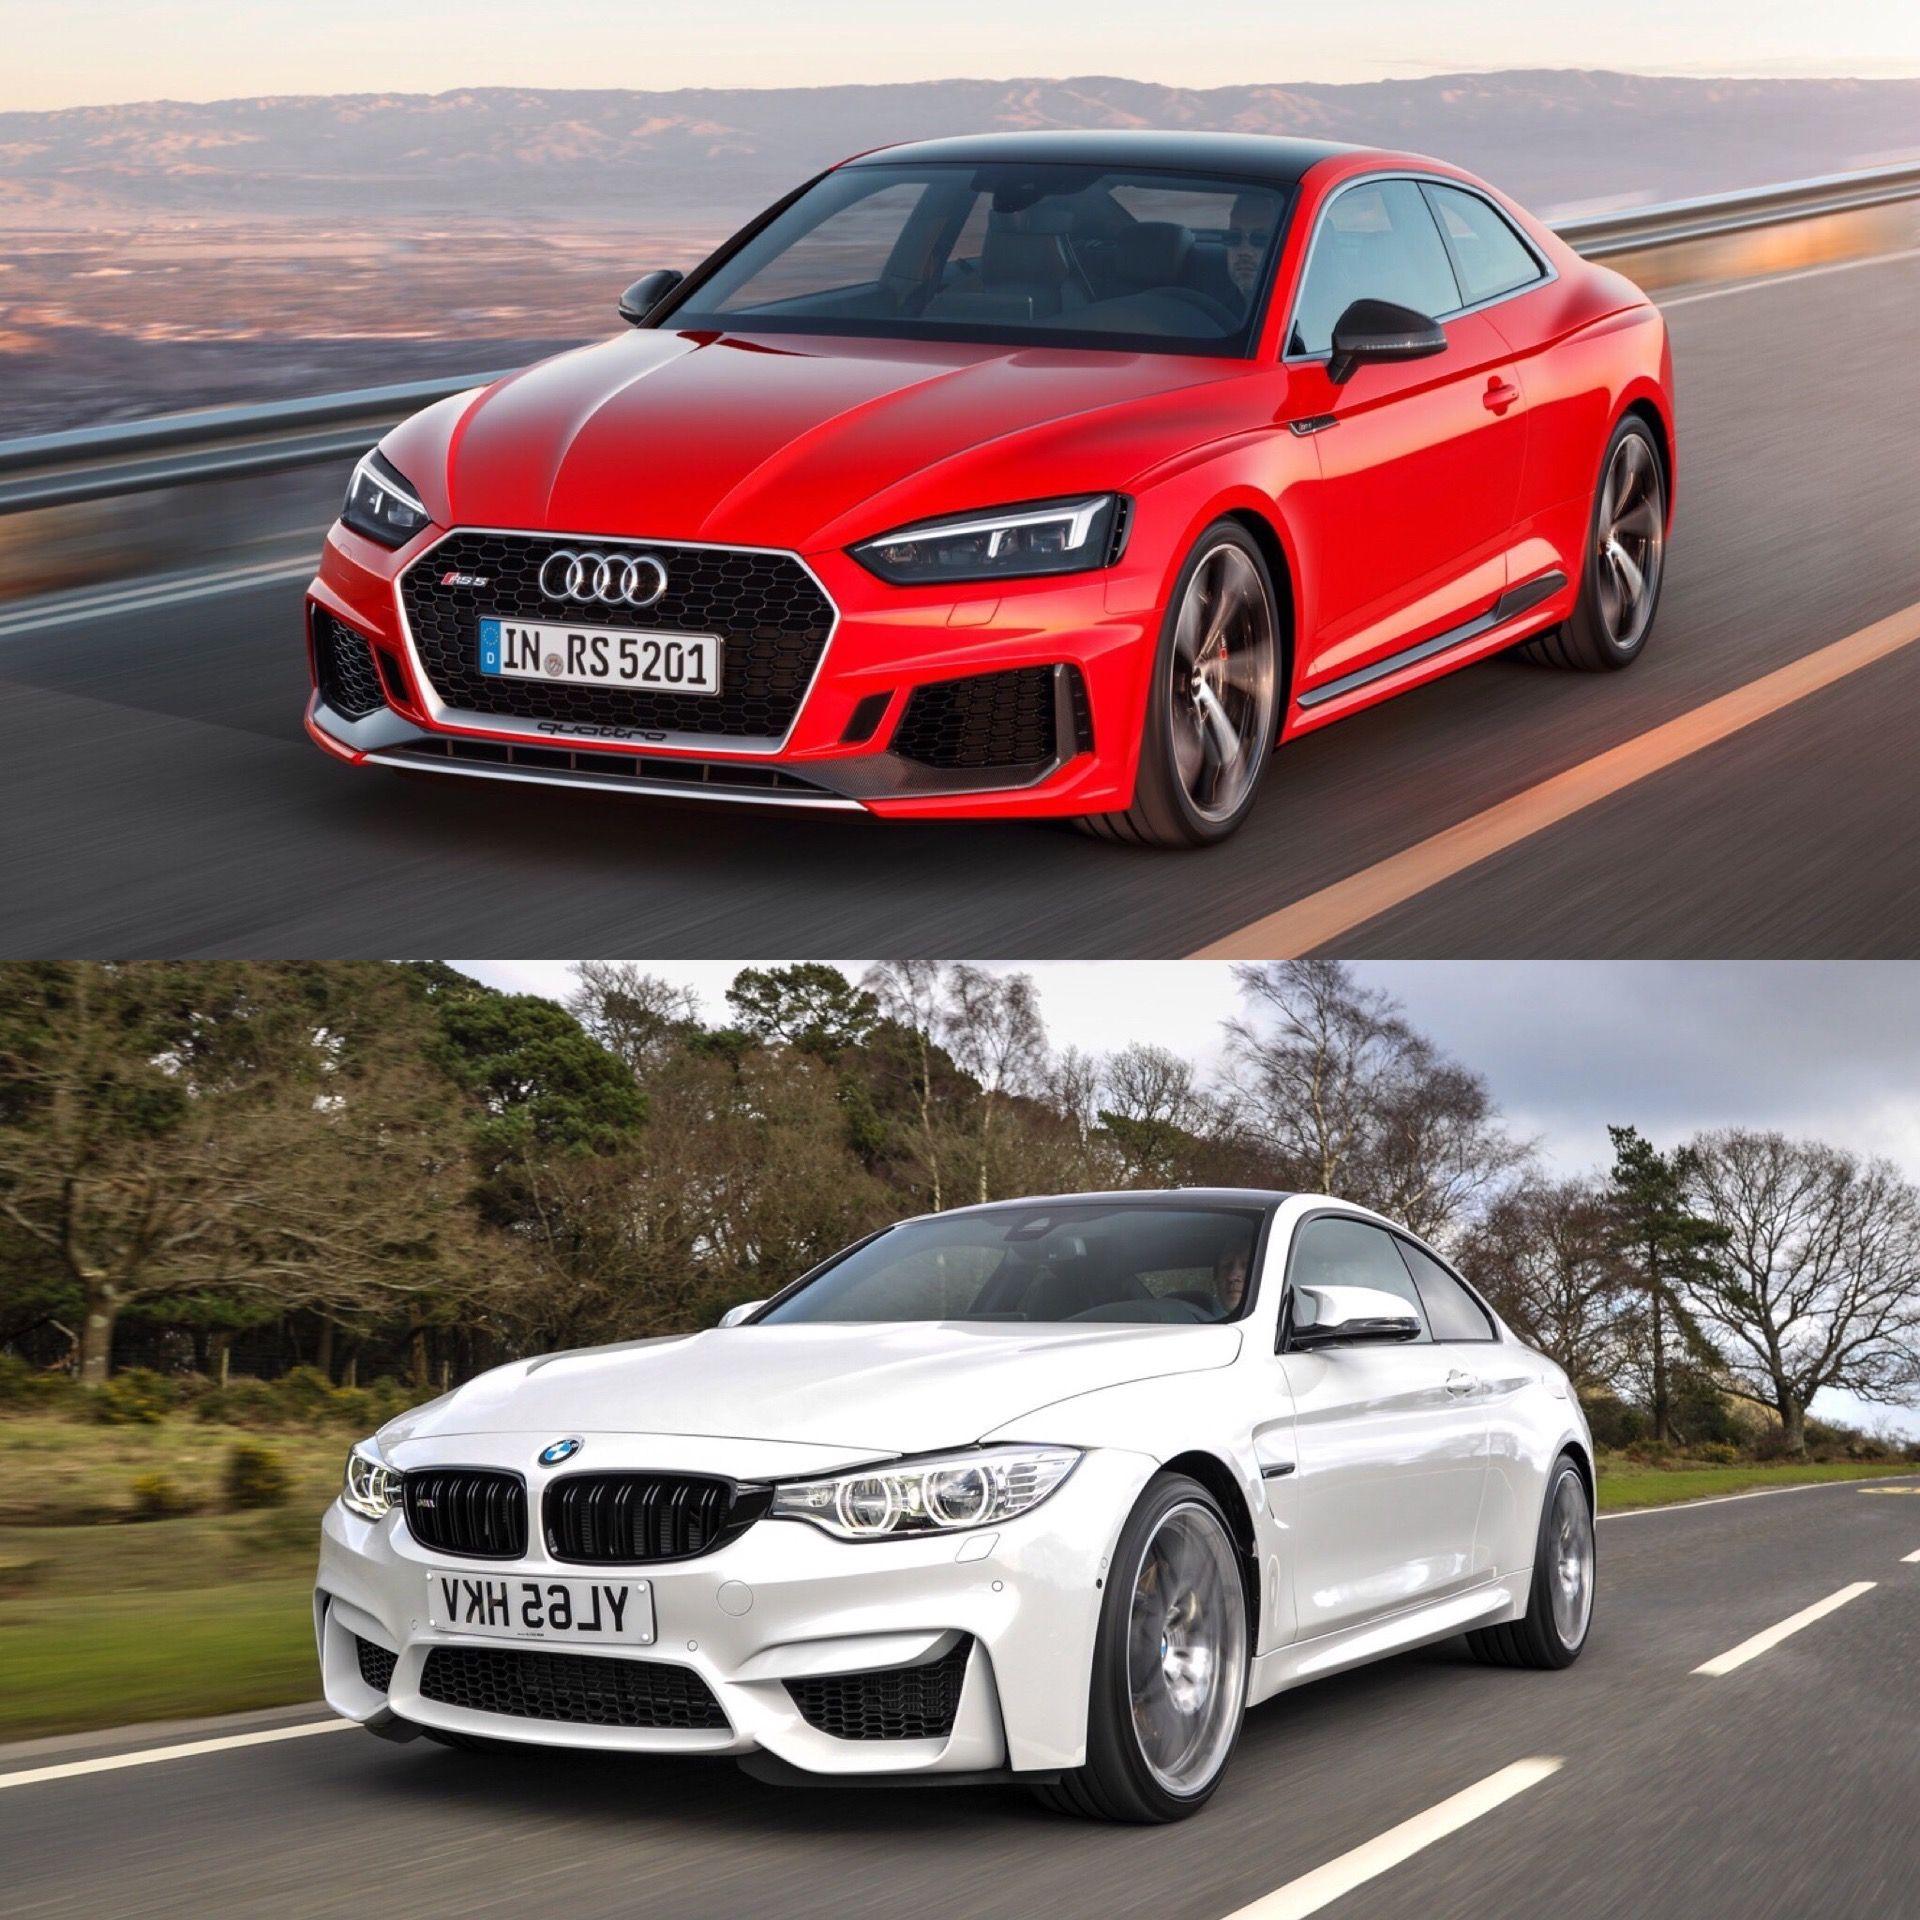 Photo Comparison 2018 Audi A7 Vs Bmw 6 Series Gran Turismo: Photo Comparison: Audi RS5 Vs BMW M4 Competition Package